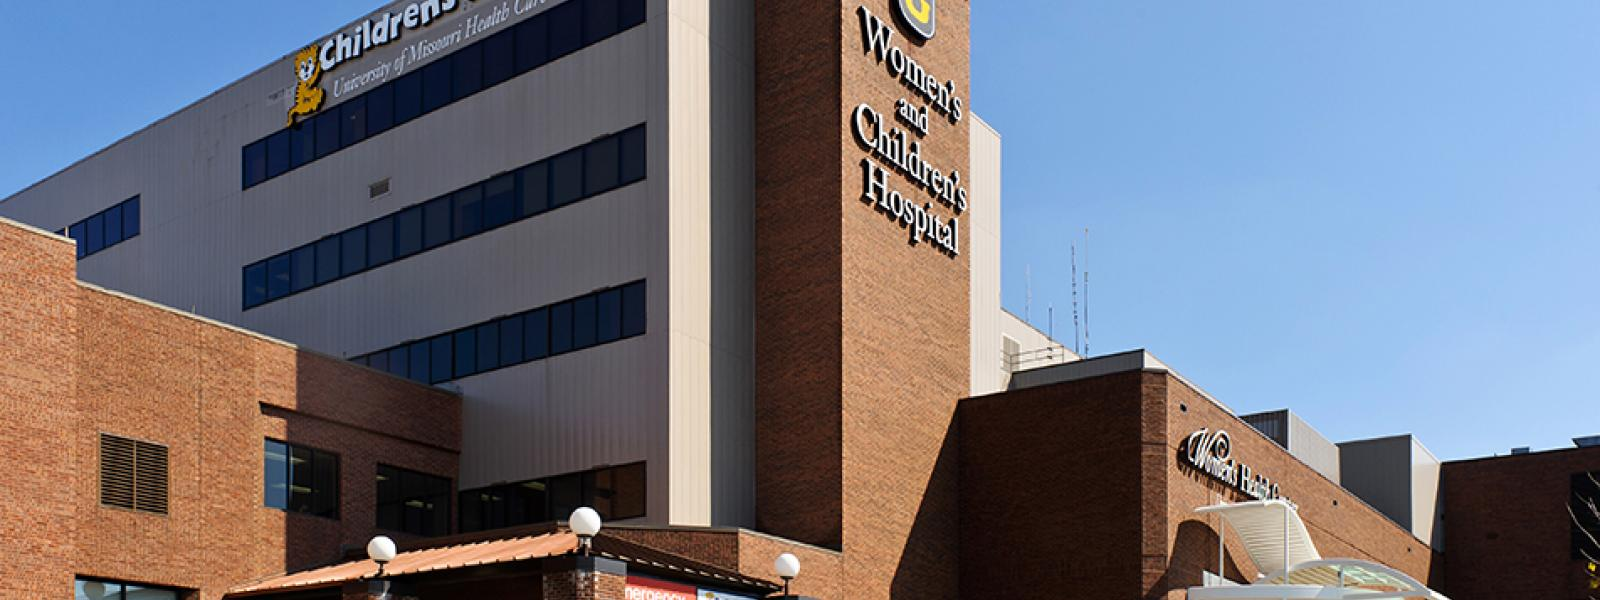 Women's and Children's Hospital - MU Health Care